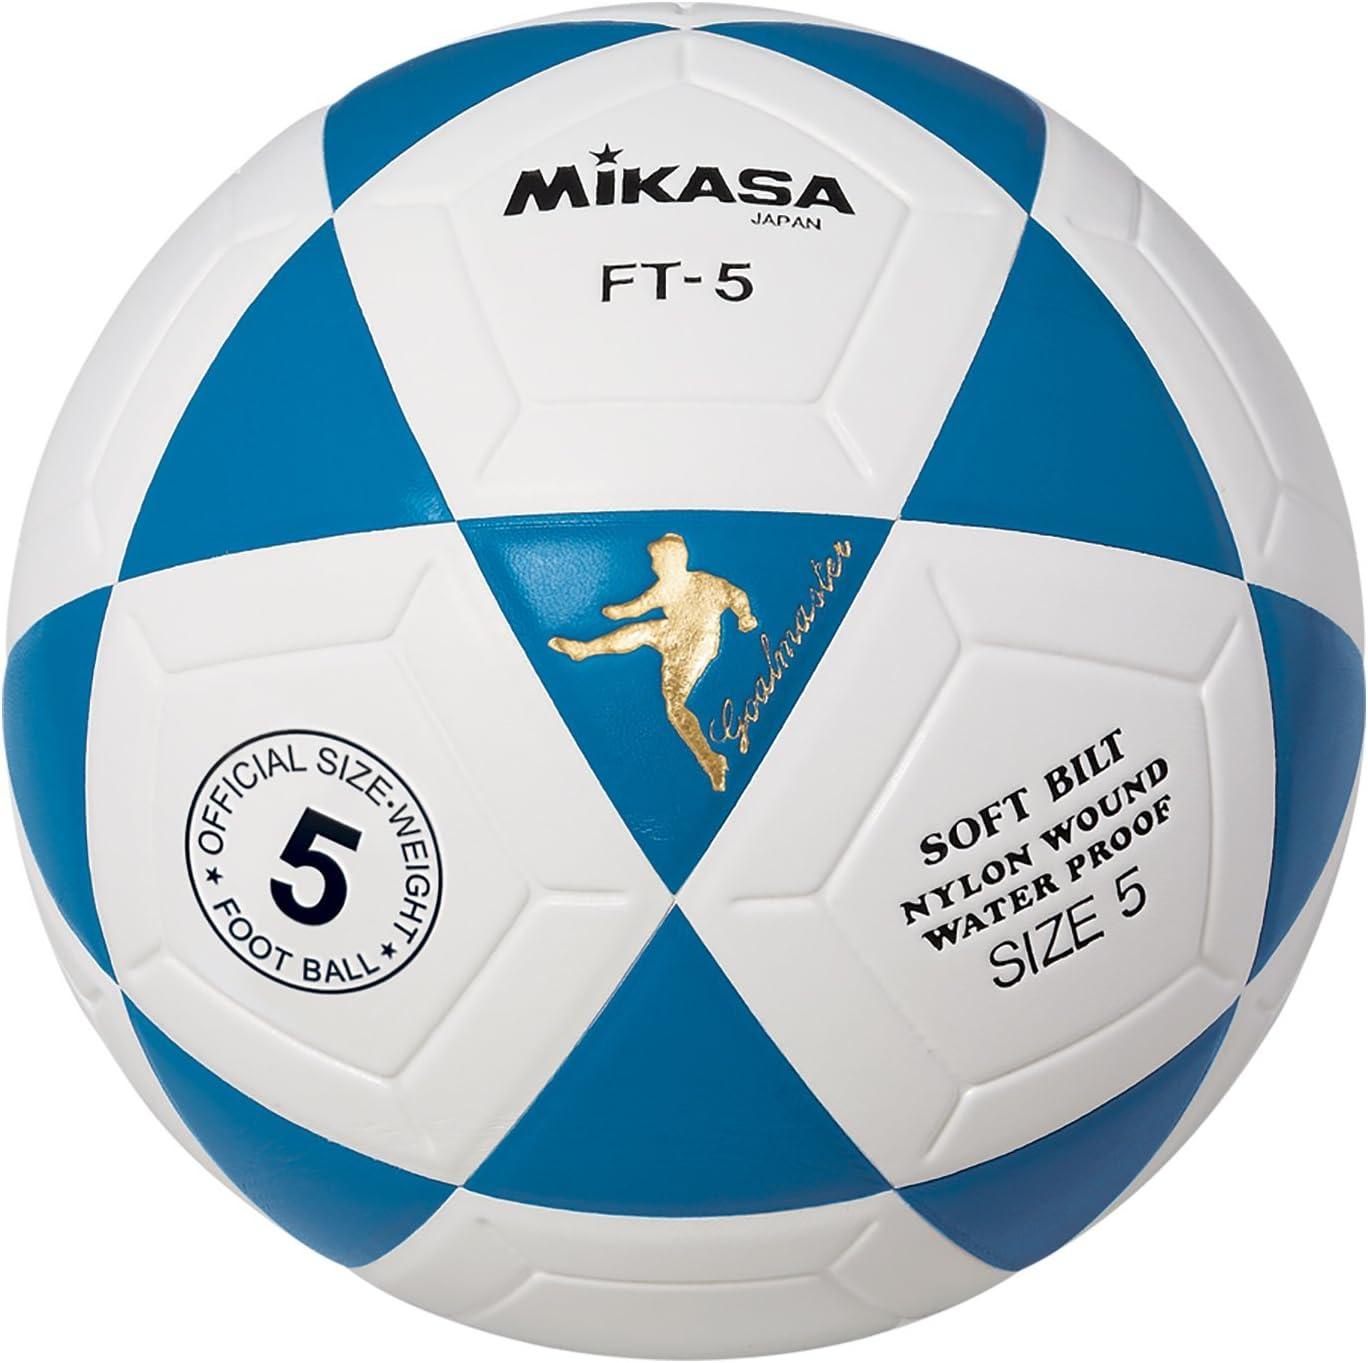 Mikasa FT5 Meta Maestro Pelota de fútbol (tamaño 5), Color Azul ...